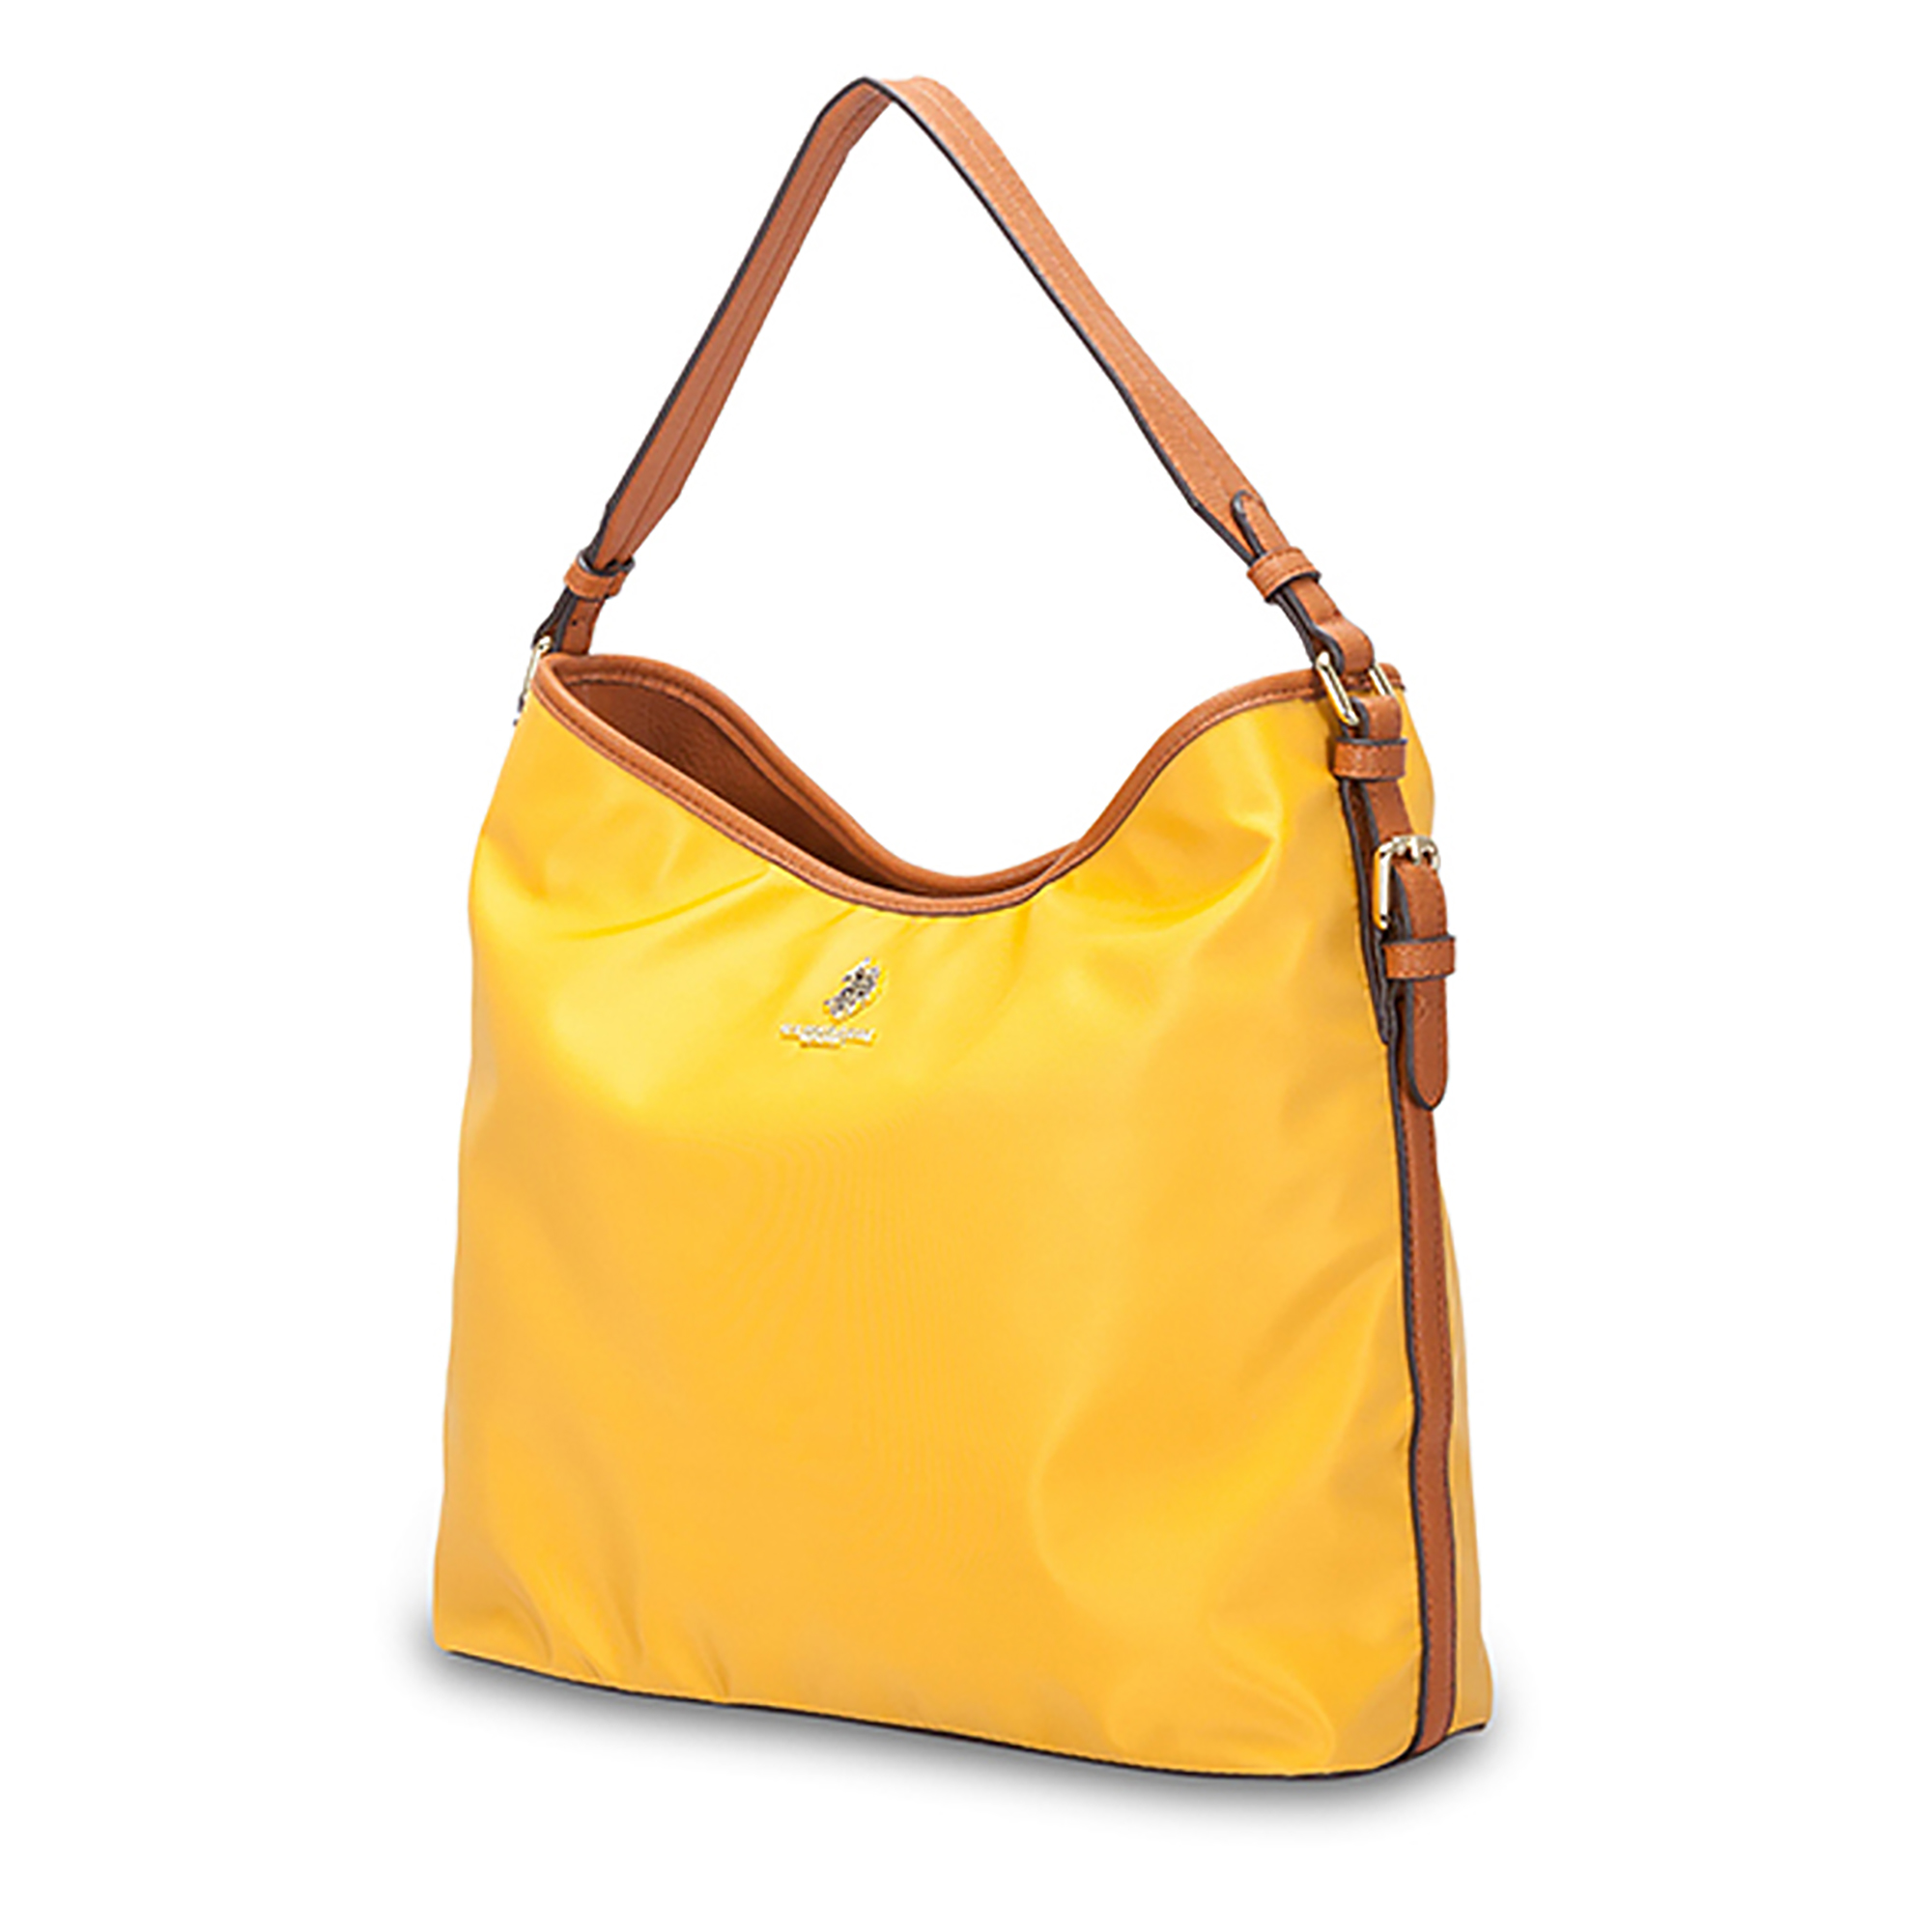 NEW-US-Polo-Assn-Houston-Hobo-Zip-Top-Handbag-Casual-Fashion-Nylon-Single-Strap thumbnail 14